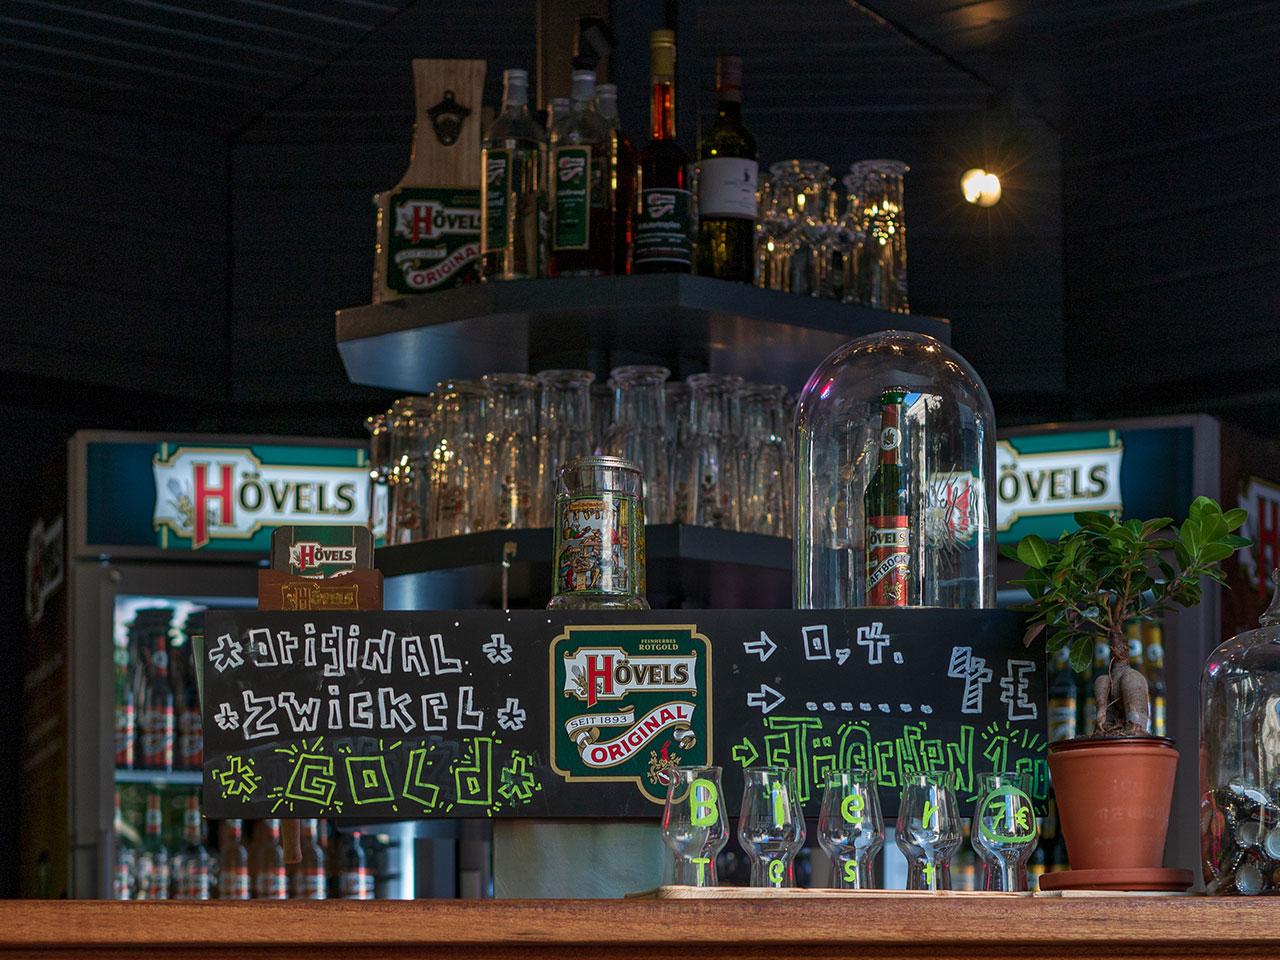 Biergarten mit Pavillon in der Dortmunder Innenstadt - Hövels Hausbrauerei